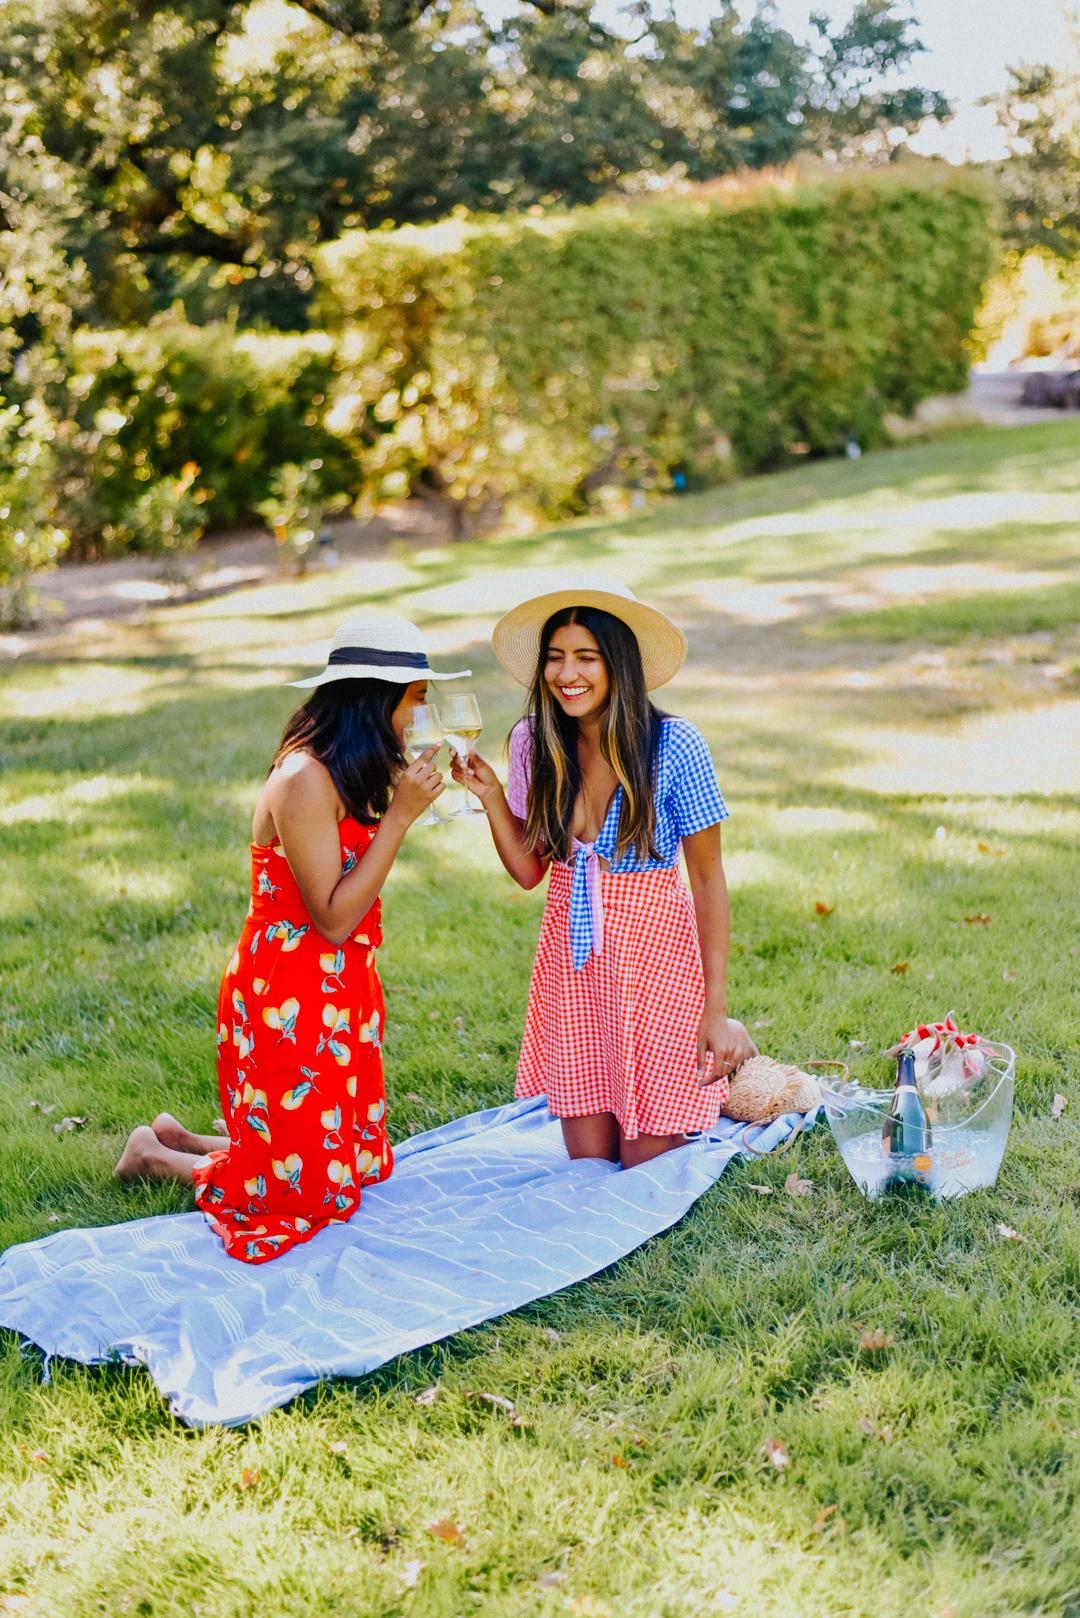 Napa-valley-roadtrip-california-sisters-summer 5